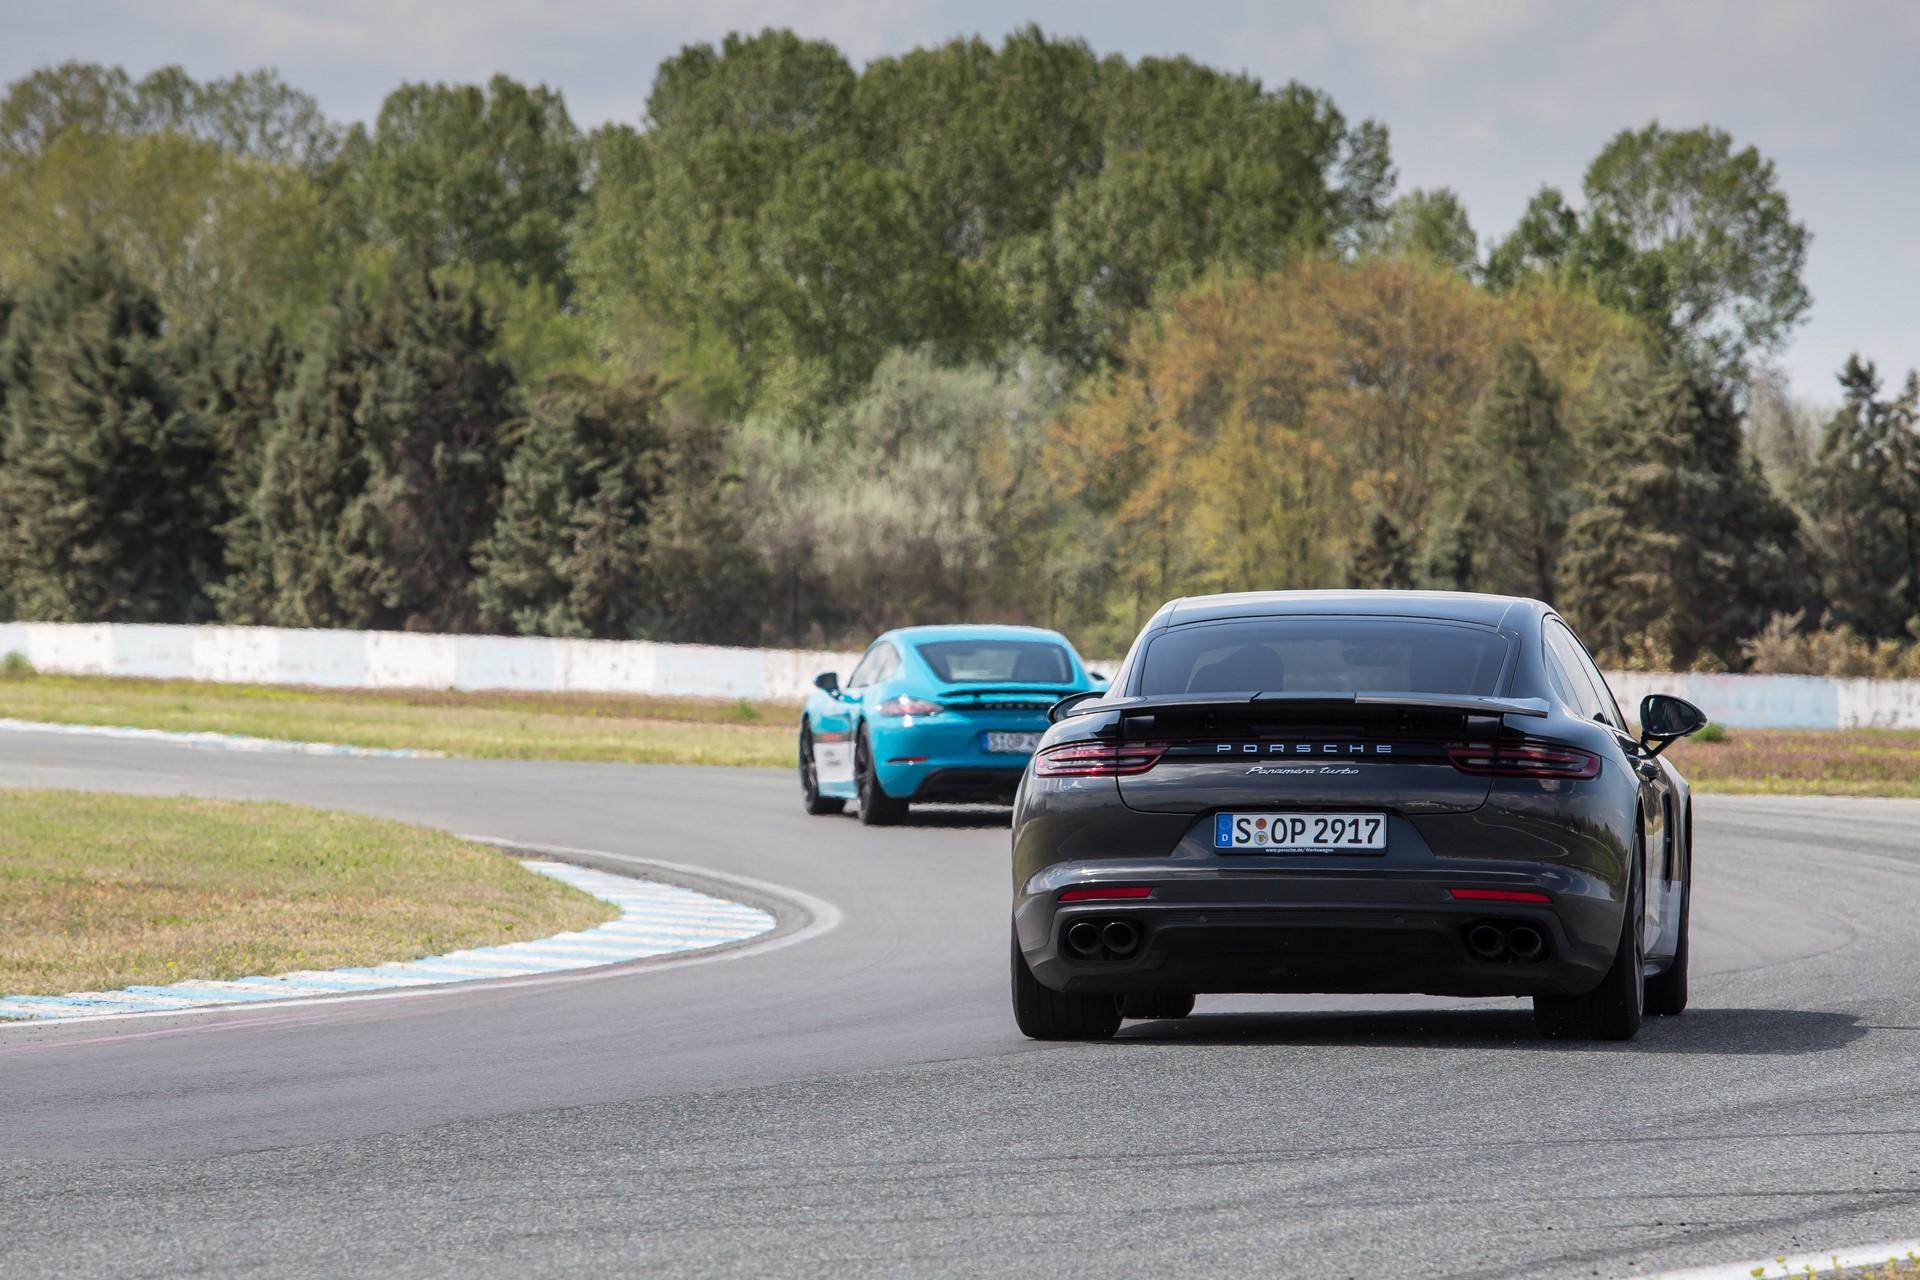 Porsche Driving Experience 2017 Serres (148)